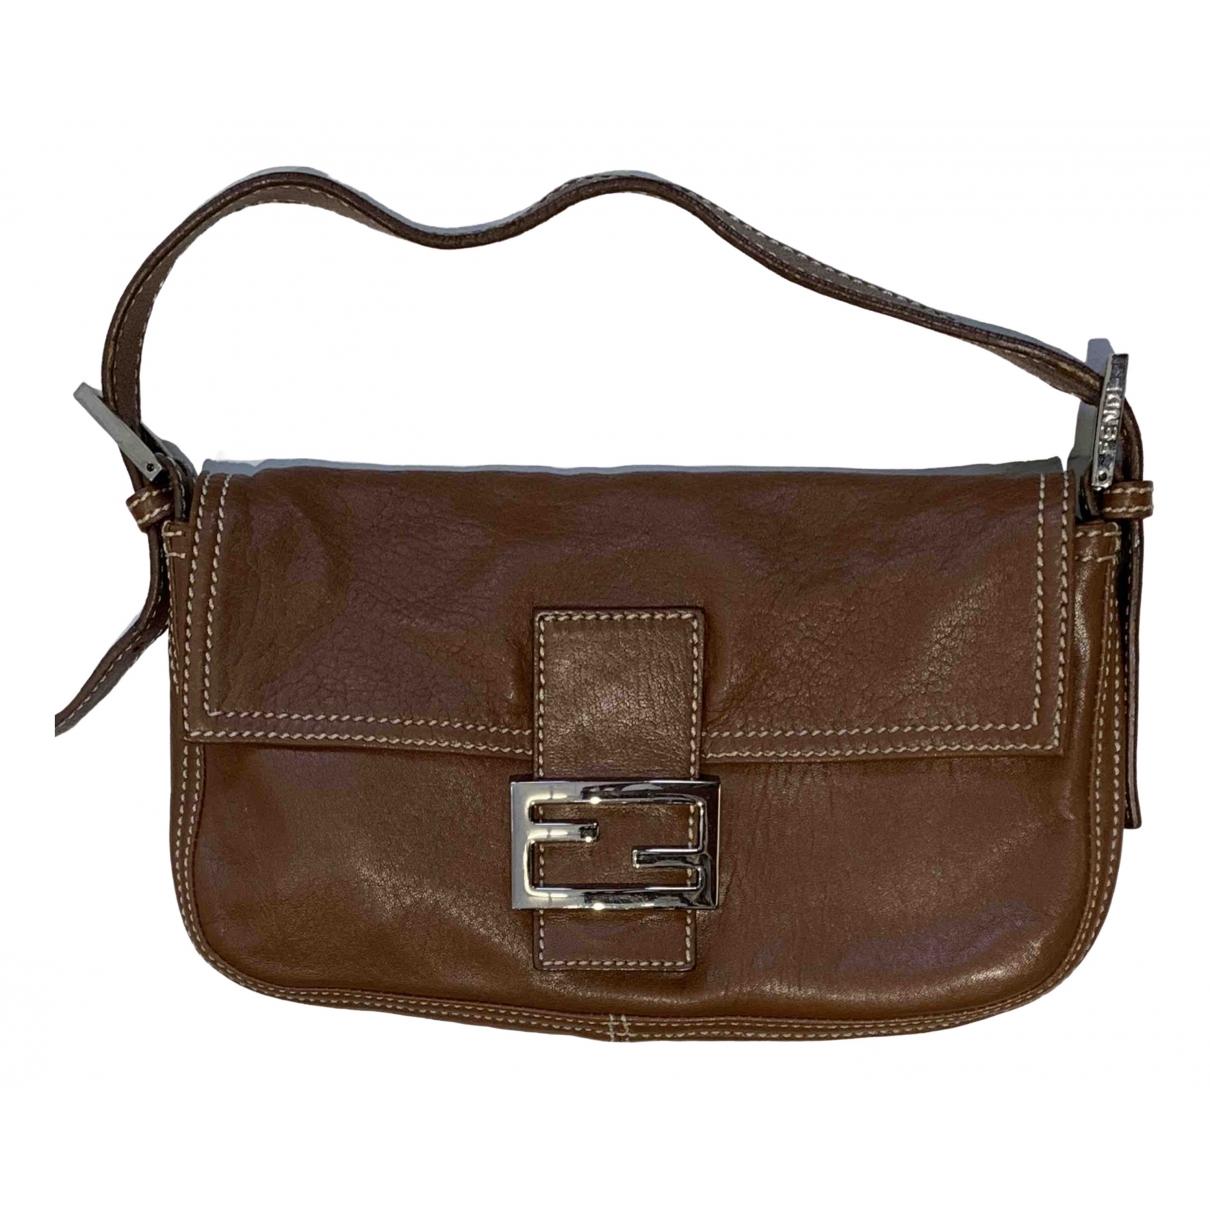 Fendi Baguette Brown Leather handbag for Women \N